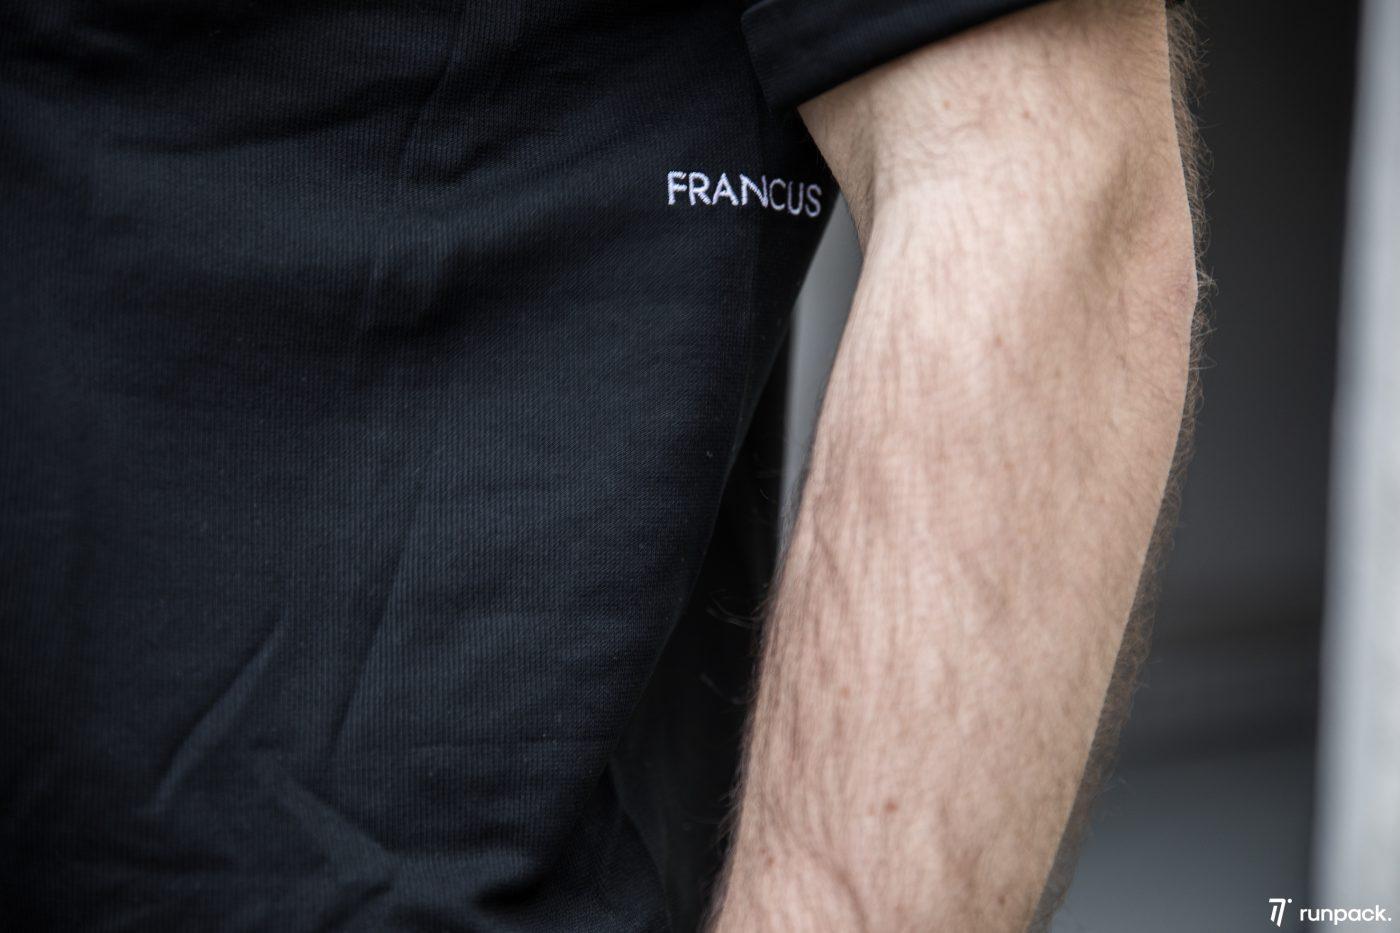 tenue-francus-running-runpack-6